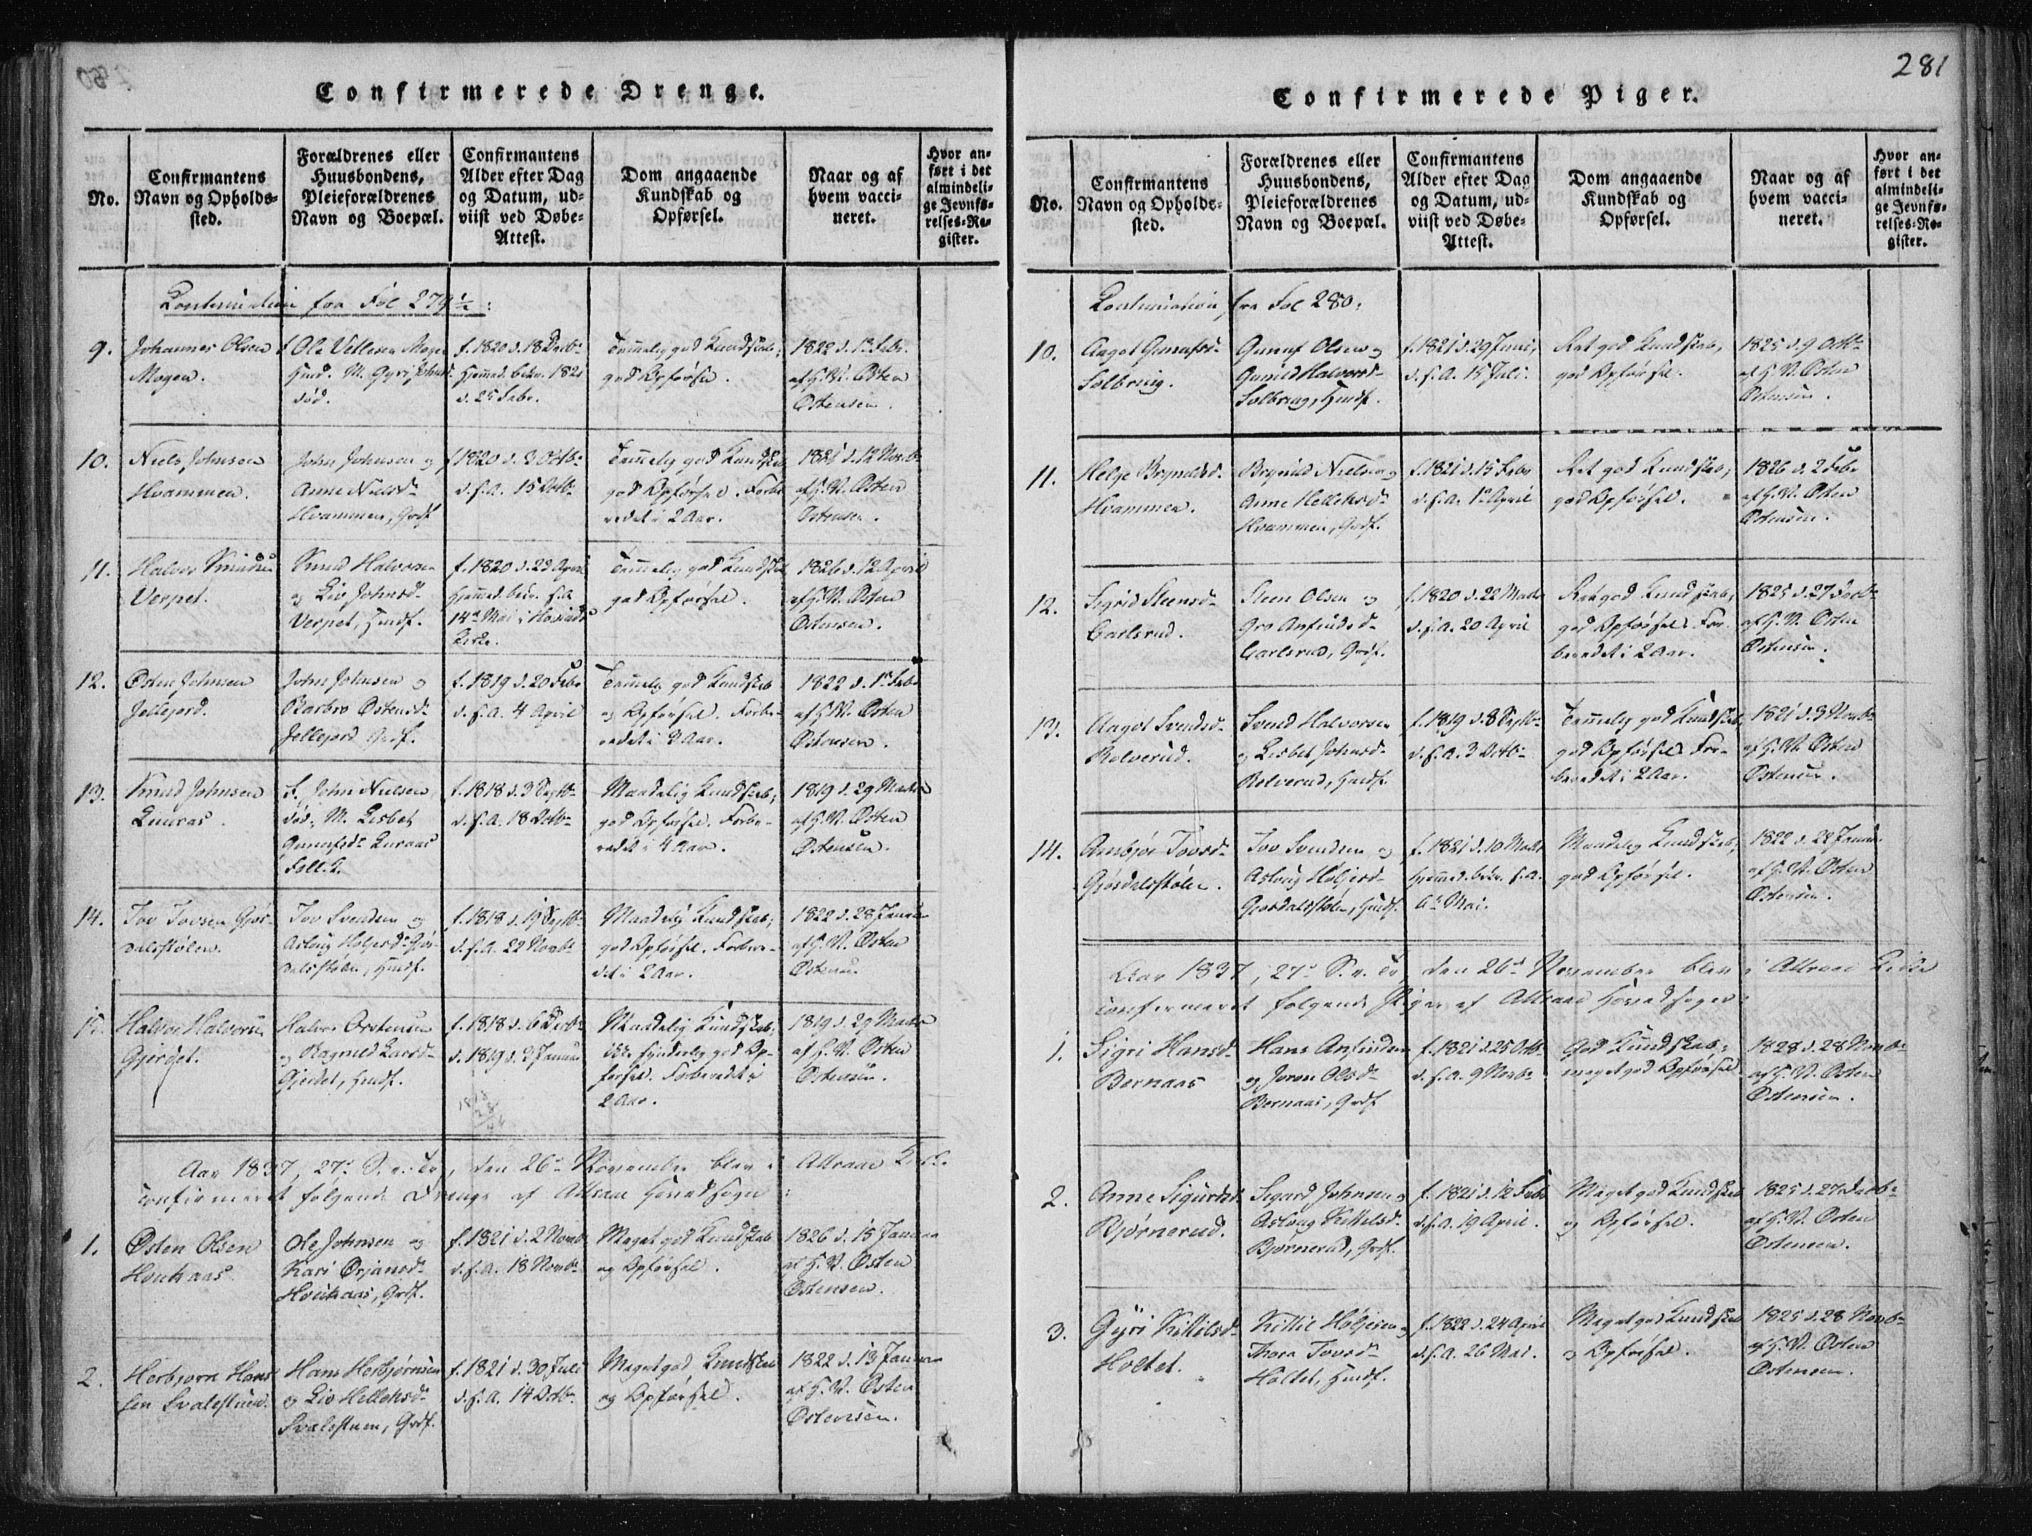 SAKO, Tinn kirkebøker, F/Fa/L0004: Ministerialbok nr. I 4, 1815-1843, s. 281